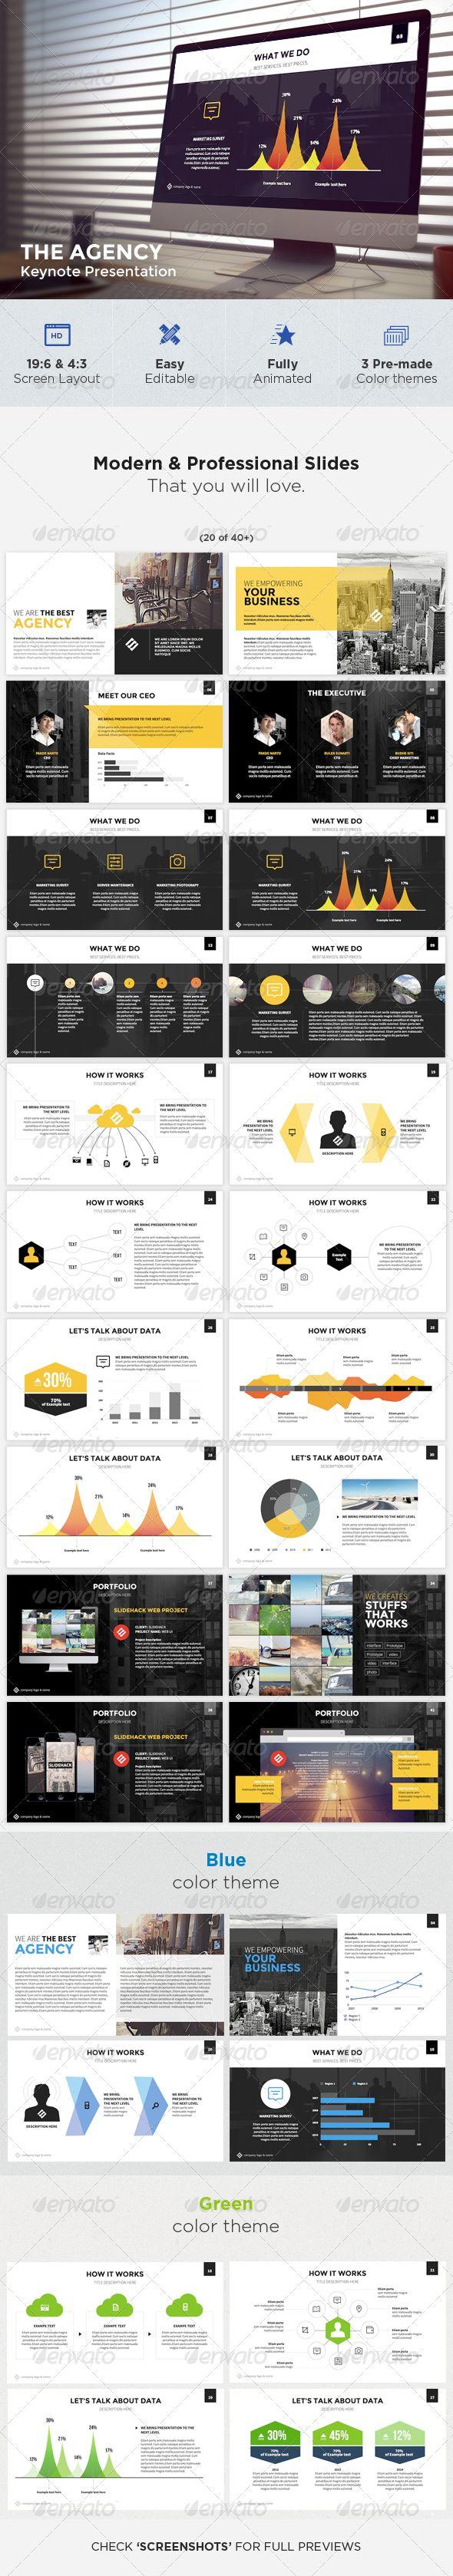 The Agency - Modern Keynote Template - Keynote Templates Presentation Templates